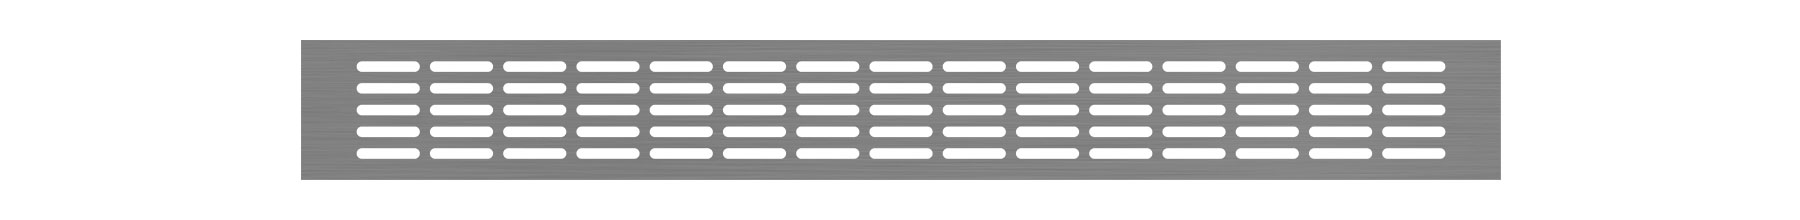 VRS-005 - Ventilaciona rešetka 66×570 mm